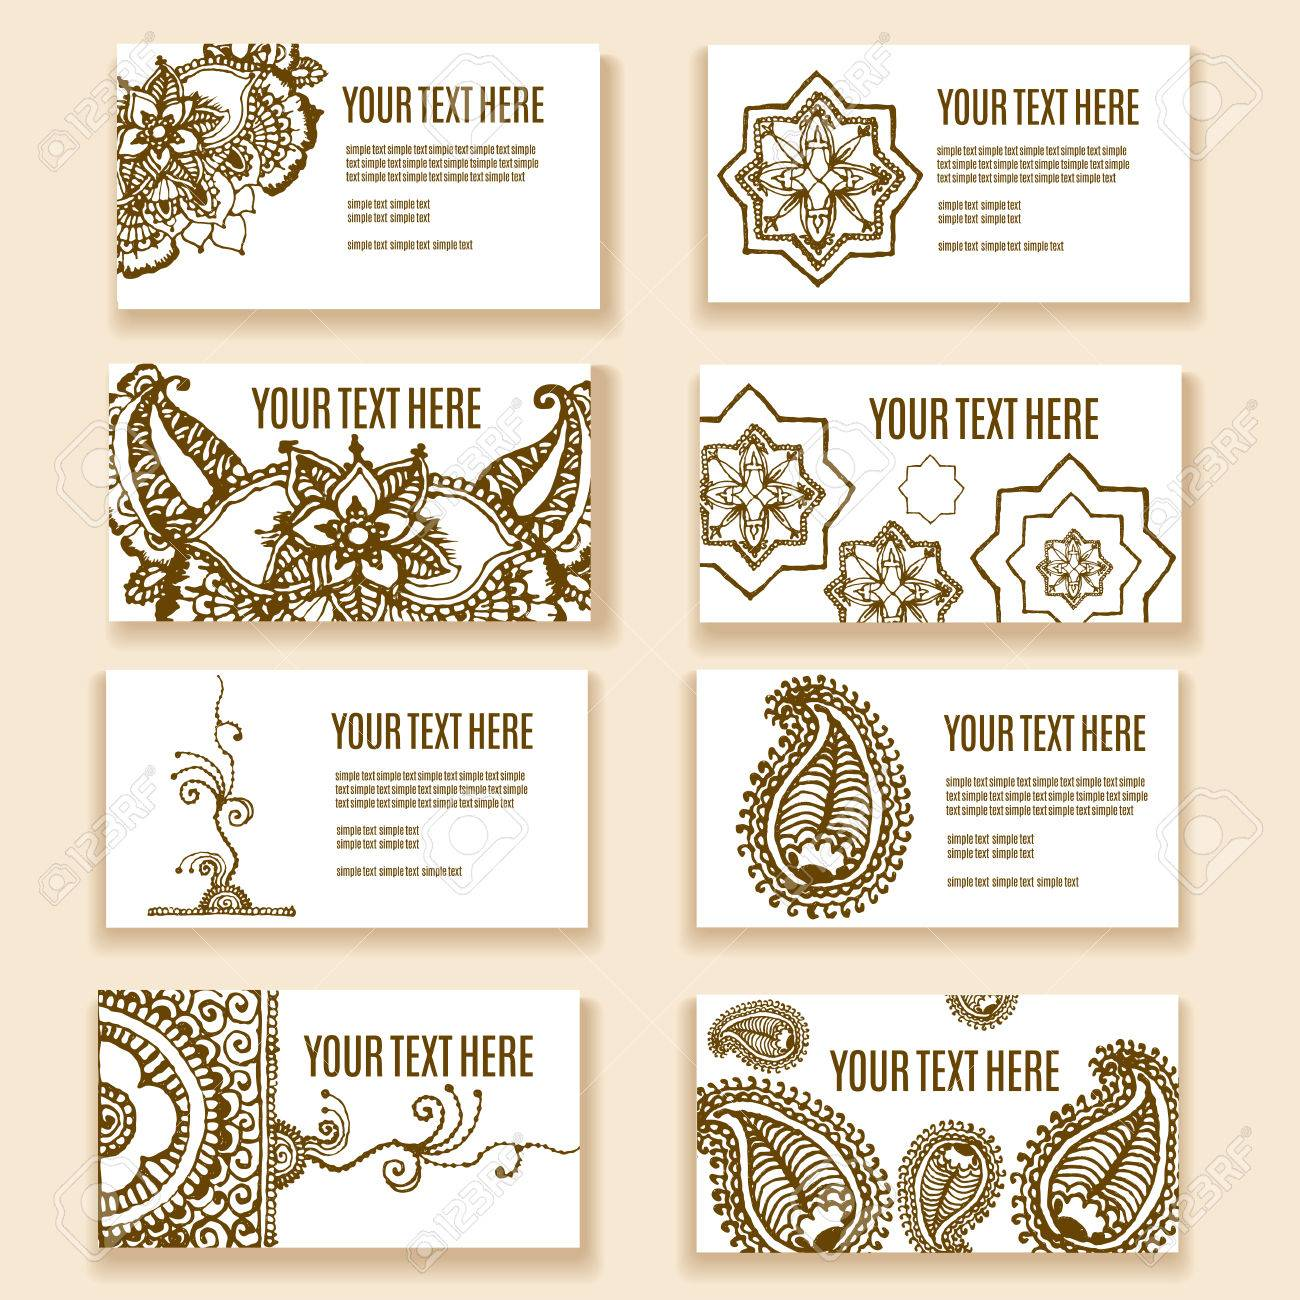 Vintage ornament design business card collection with floral vector vintage ornament design business card collection with floral texture eps 10 vector pattern set in oriental style mehendi henna tattoo colourmoves